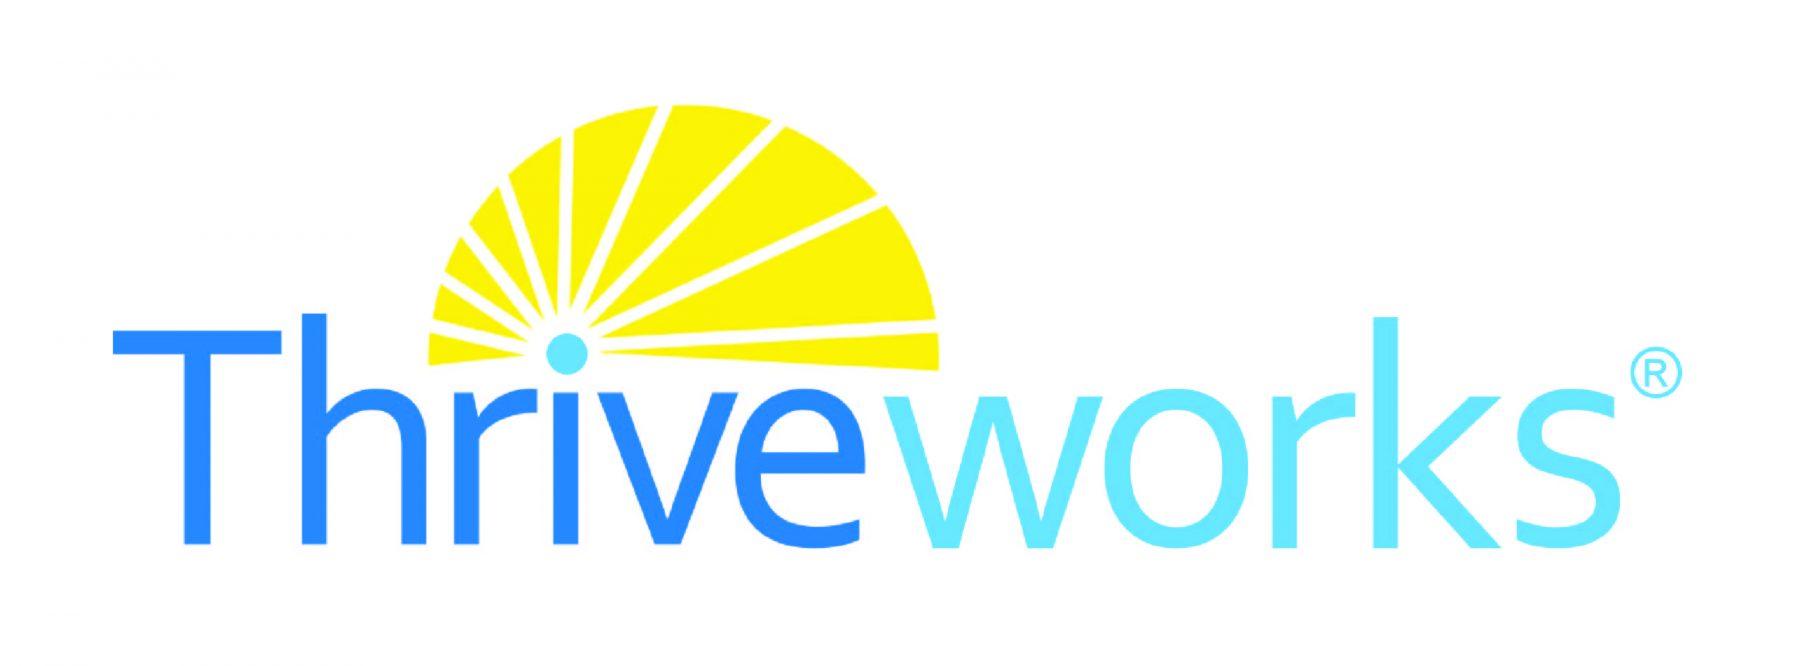 thriveworks.jpg